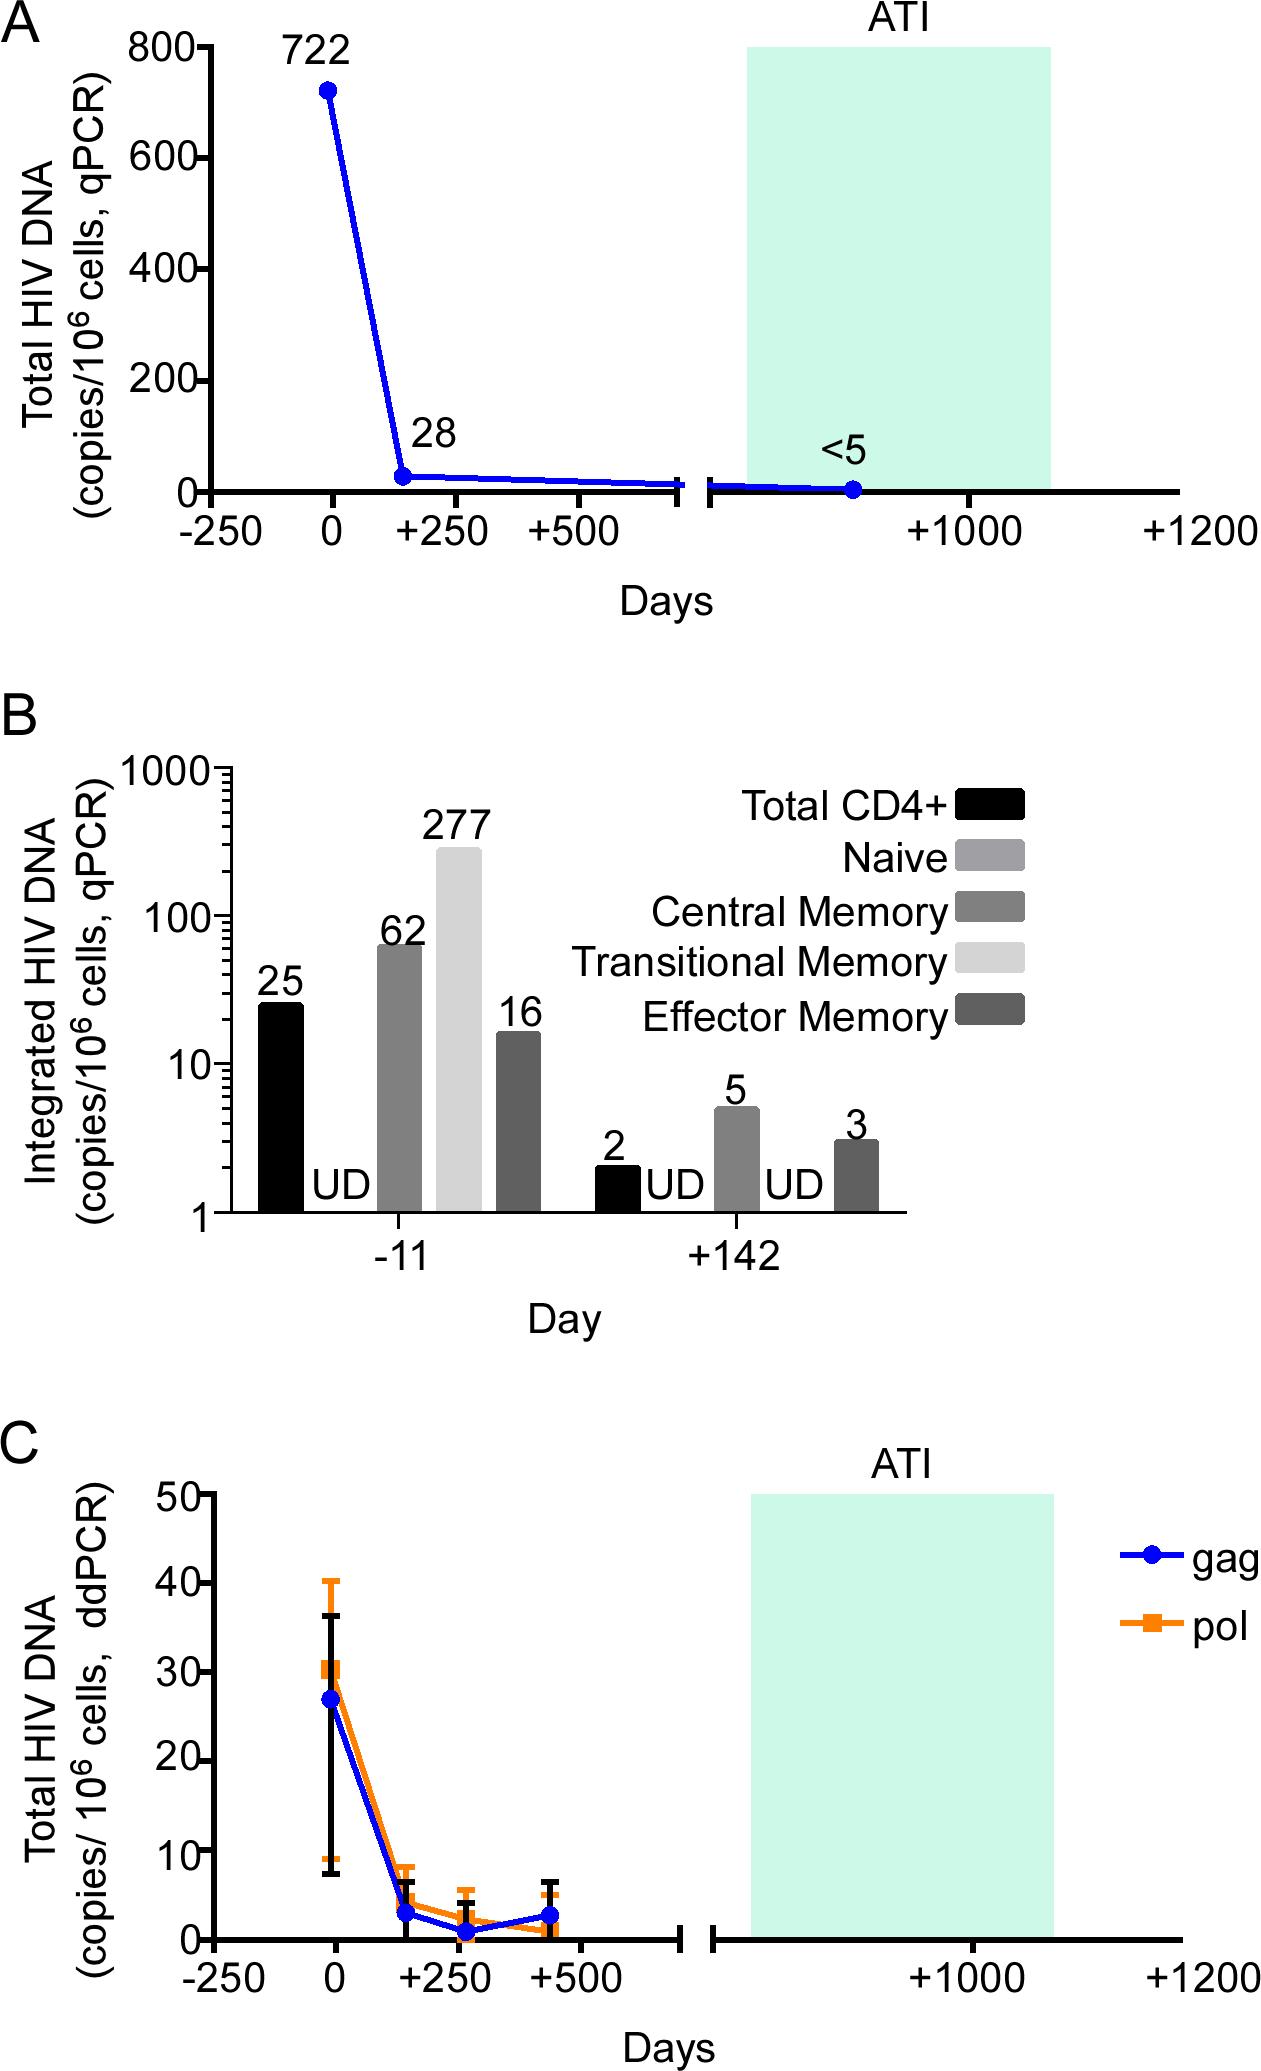 HIV-1 DNA monitoring in the peri-transplant period.